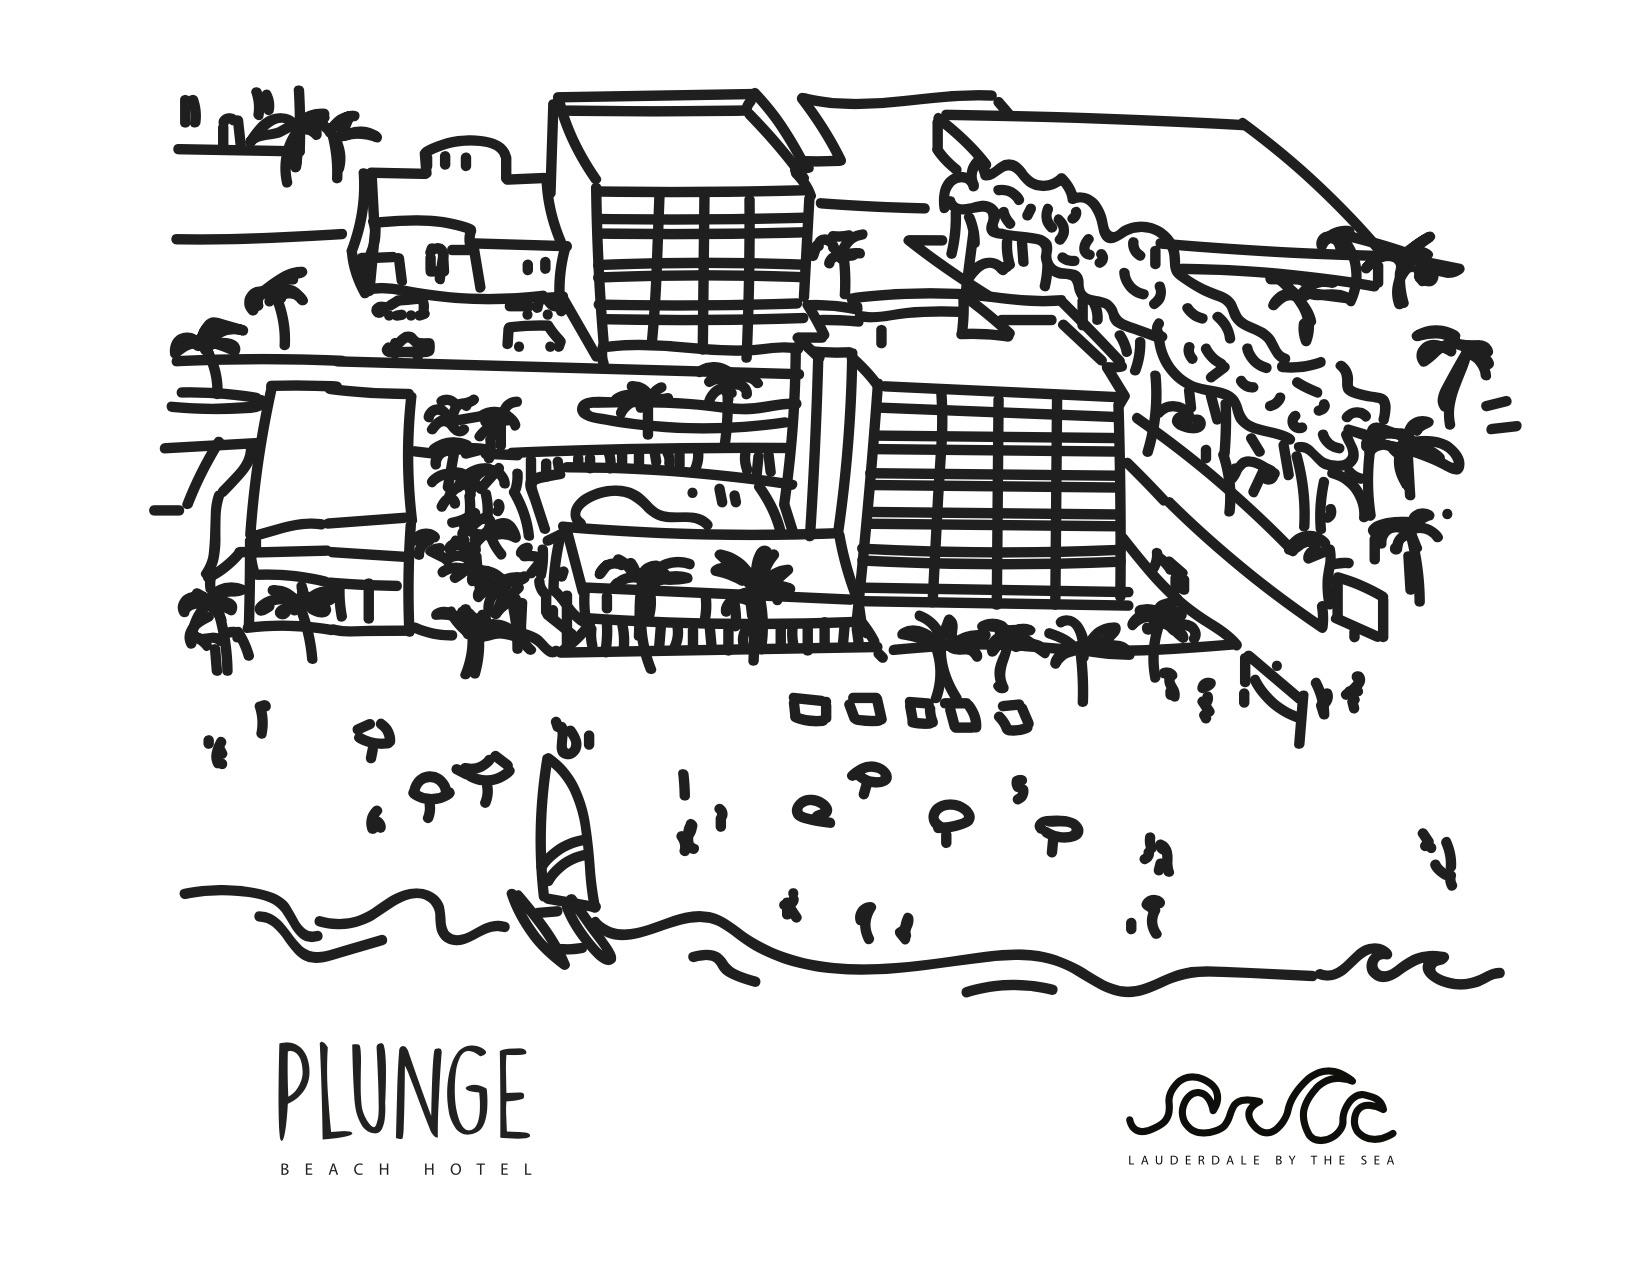 PlungePropertyIllustration.jpg